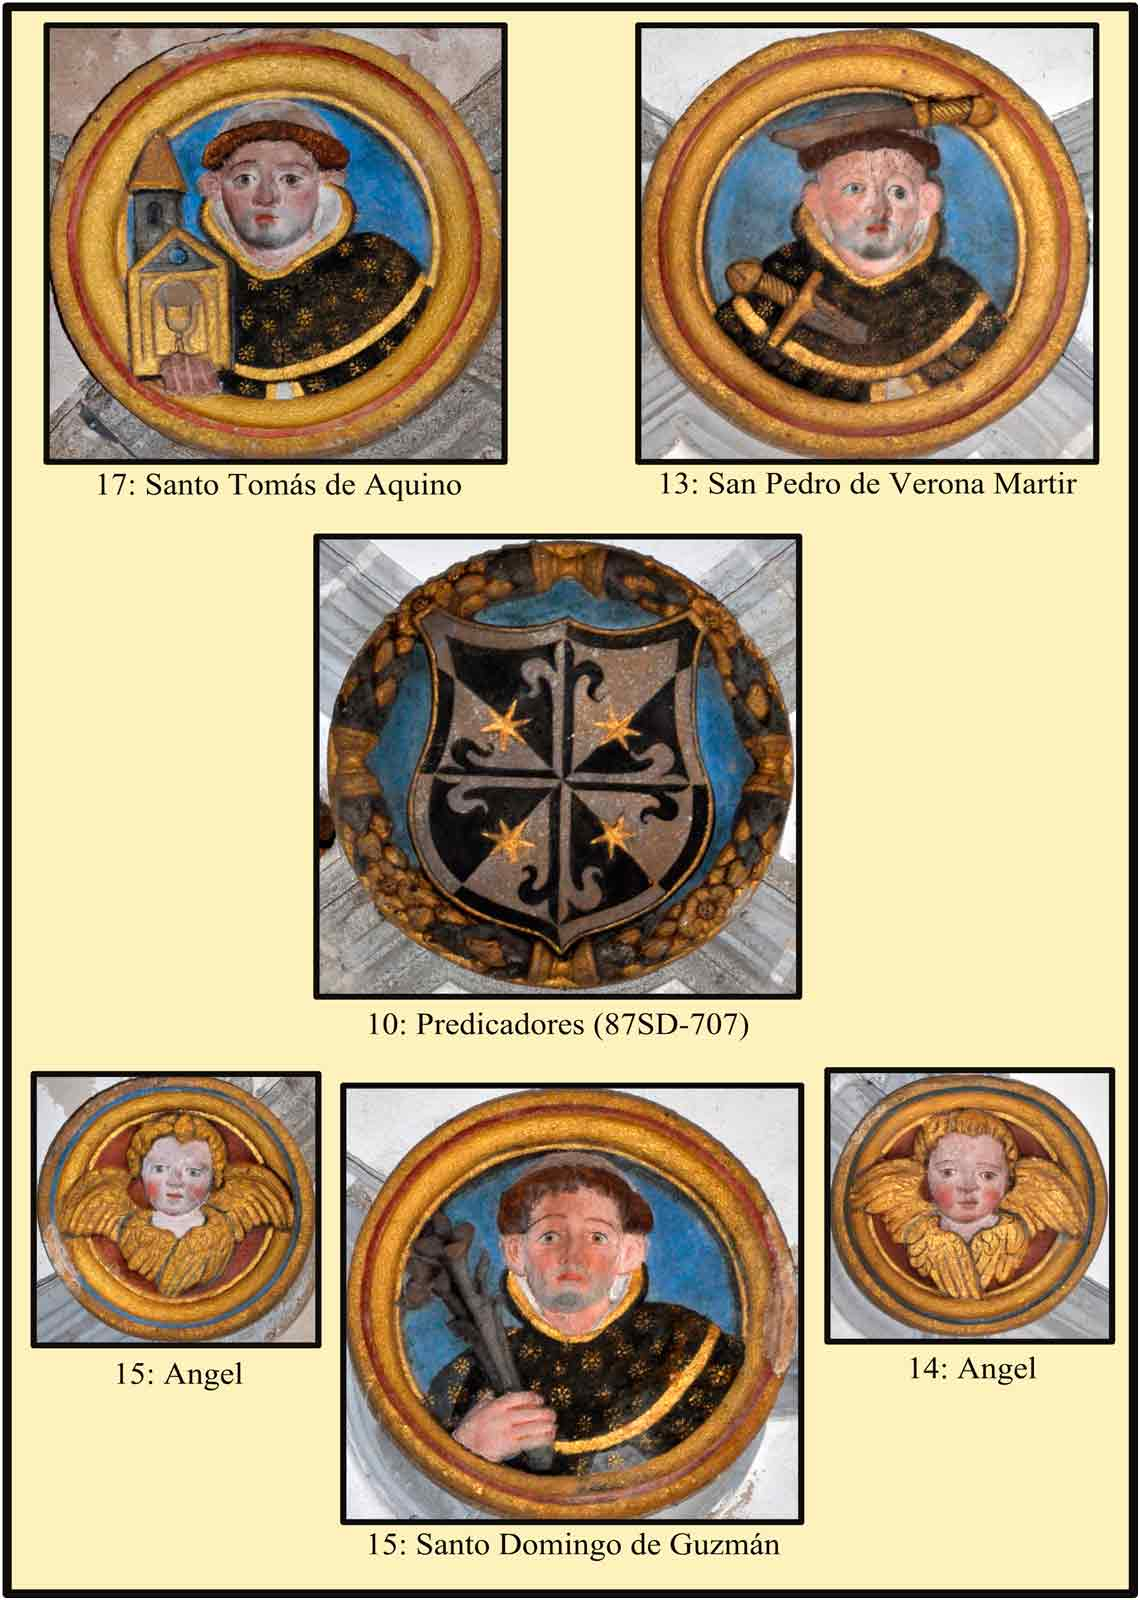 Escudo de Predicadores Santo Domingo de Guzman Tomas de Aquino